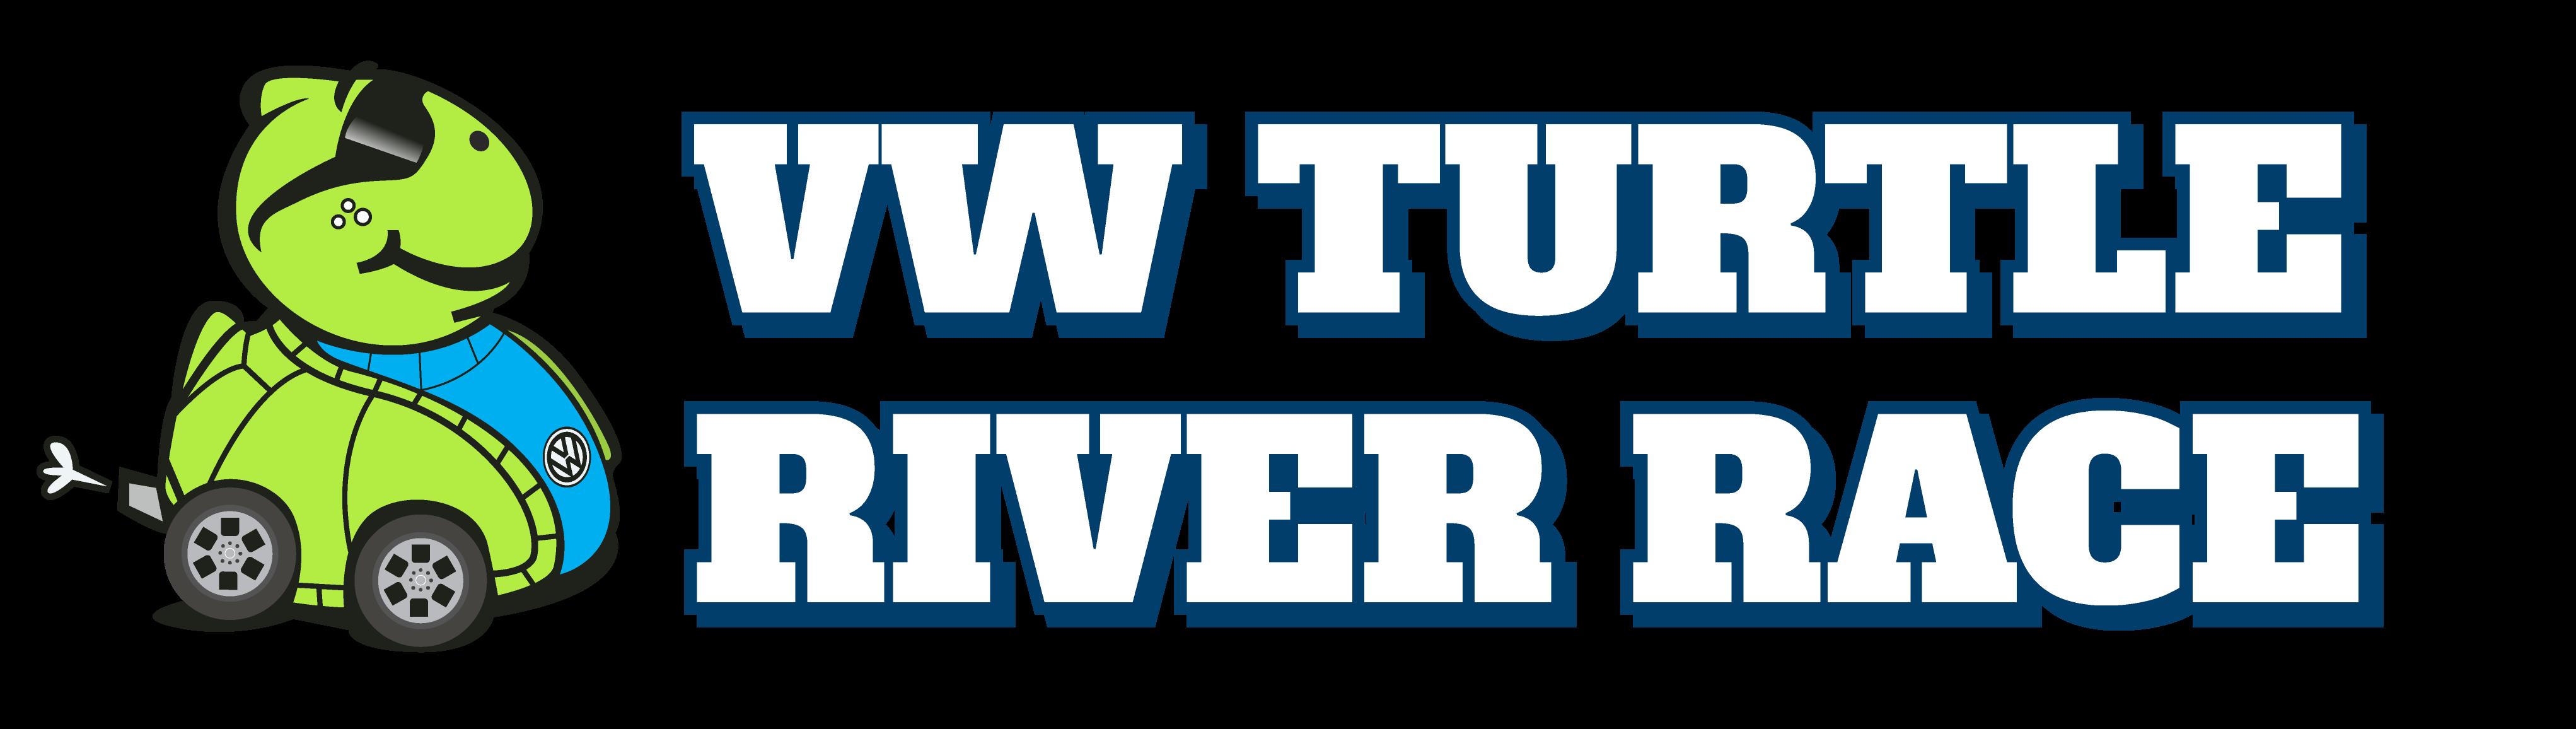 VW Turtle River Race